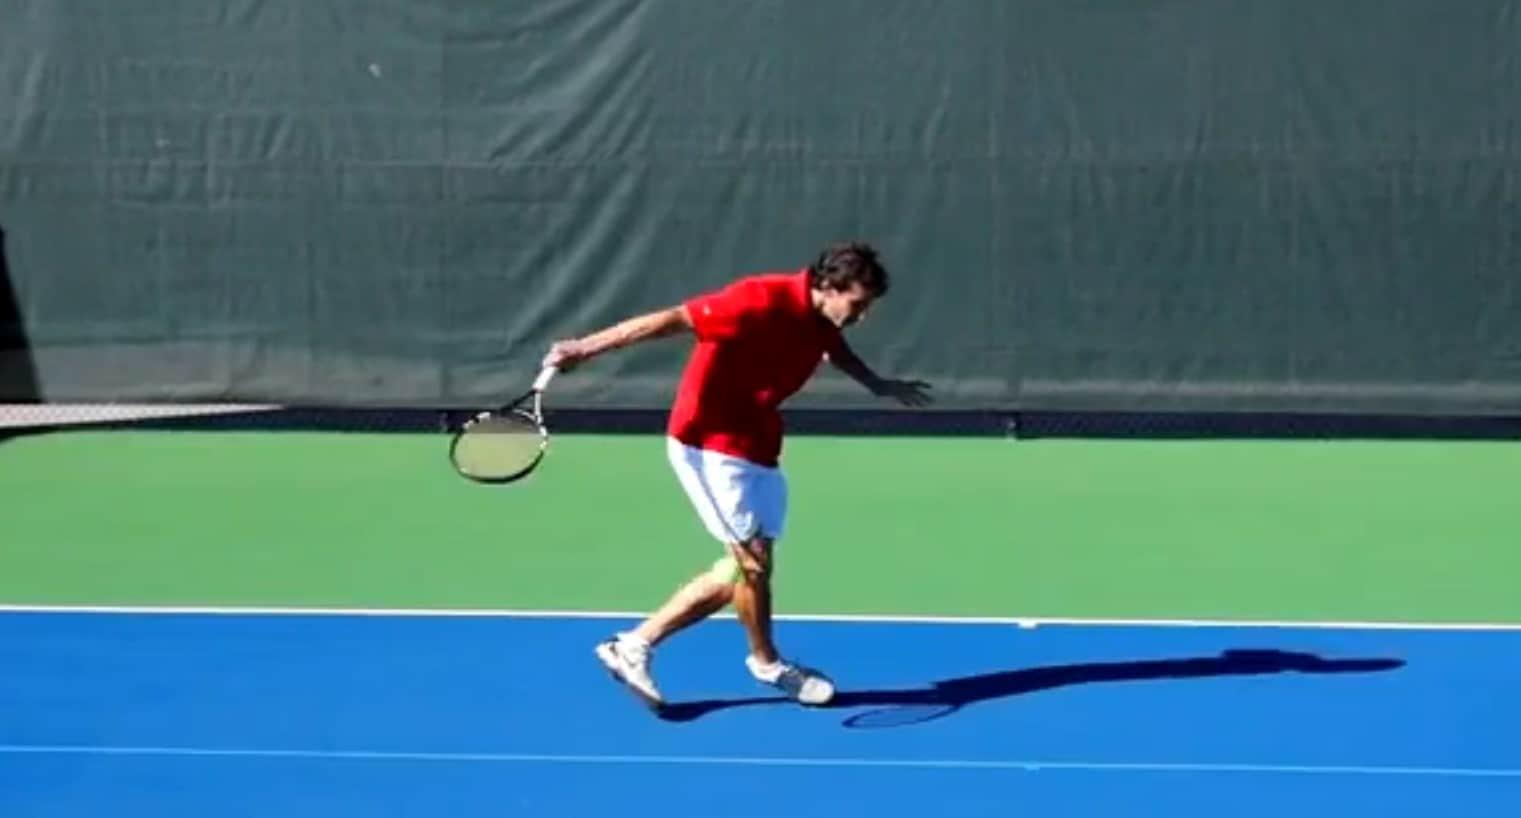 Carioca Tennis Footwork Pattern